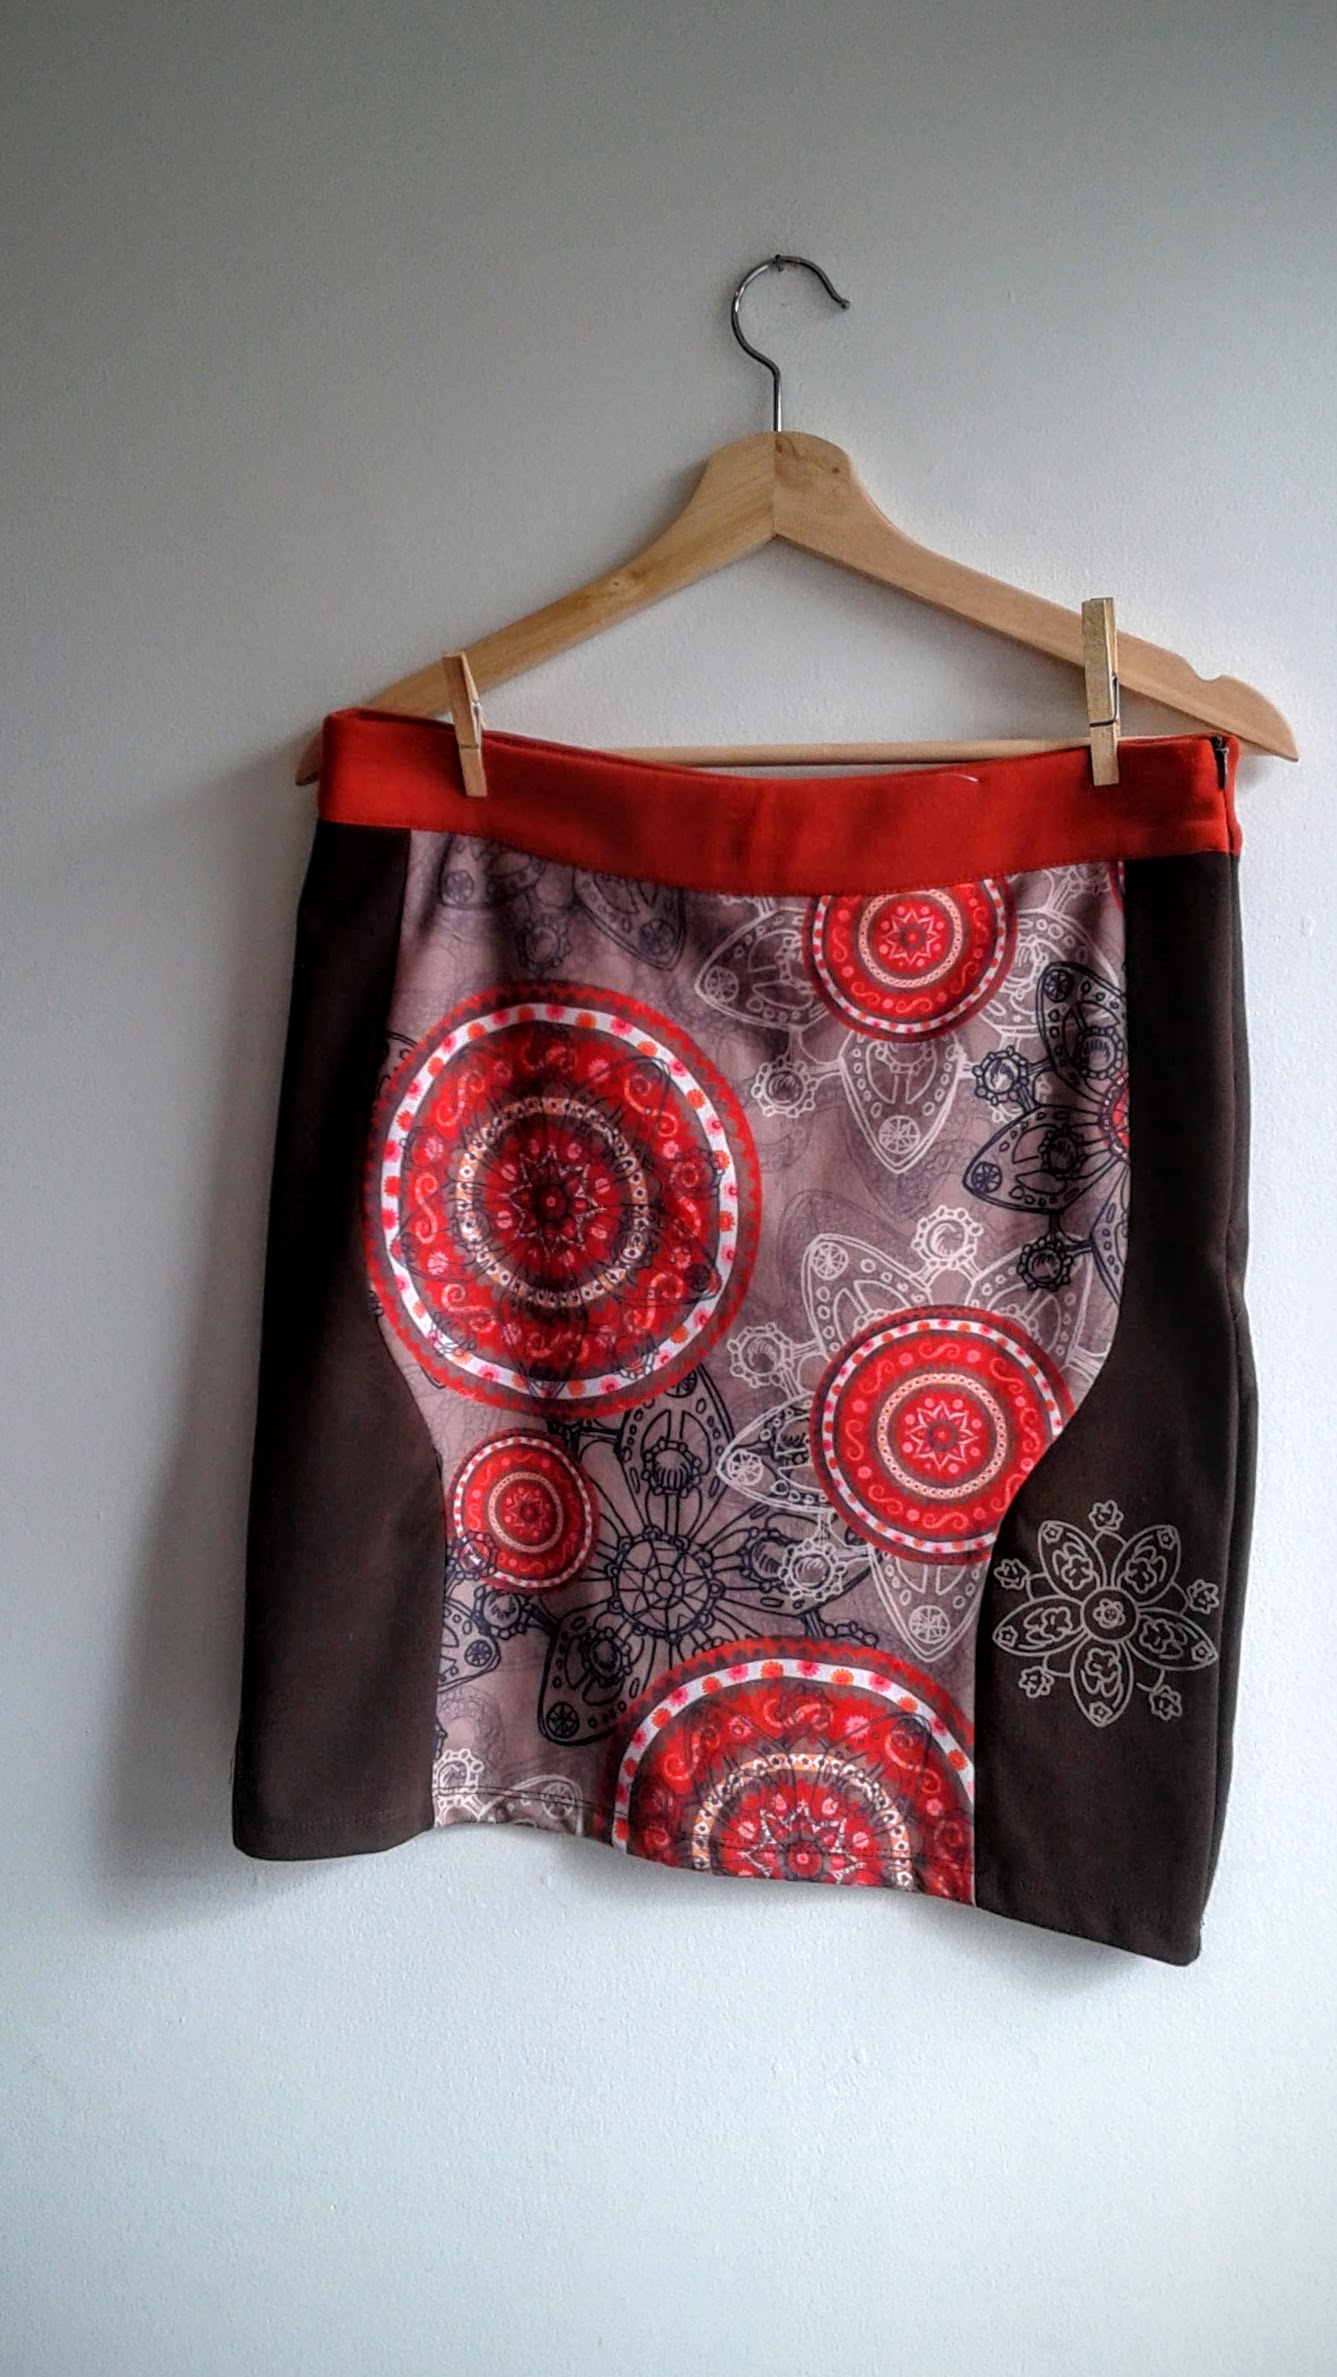 Smash  skirt; Size M, $20